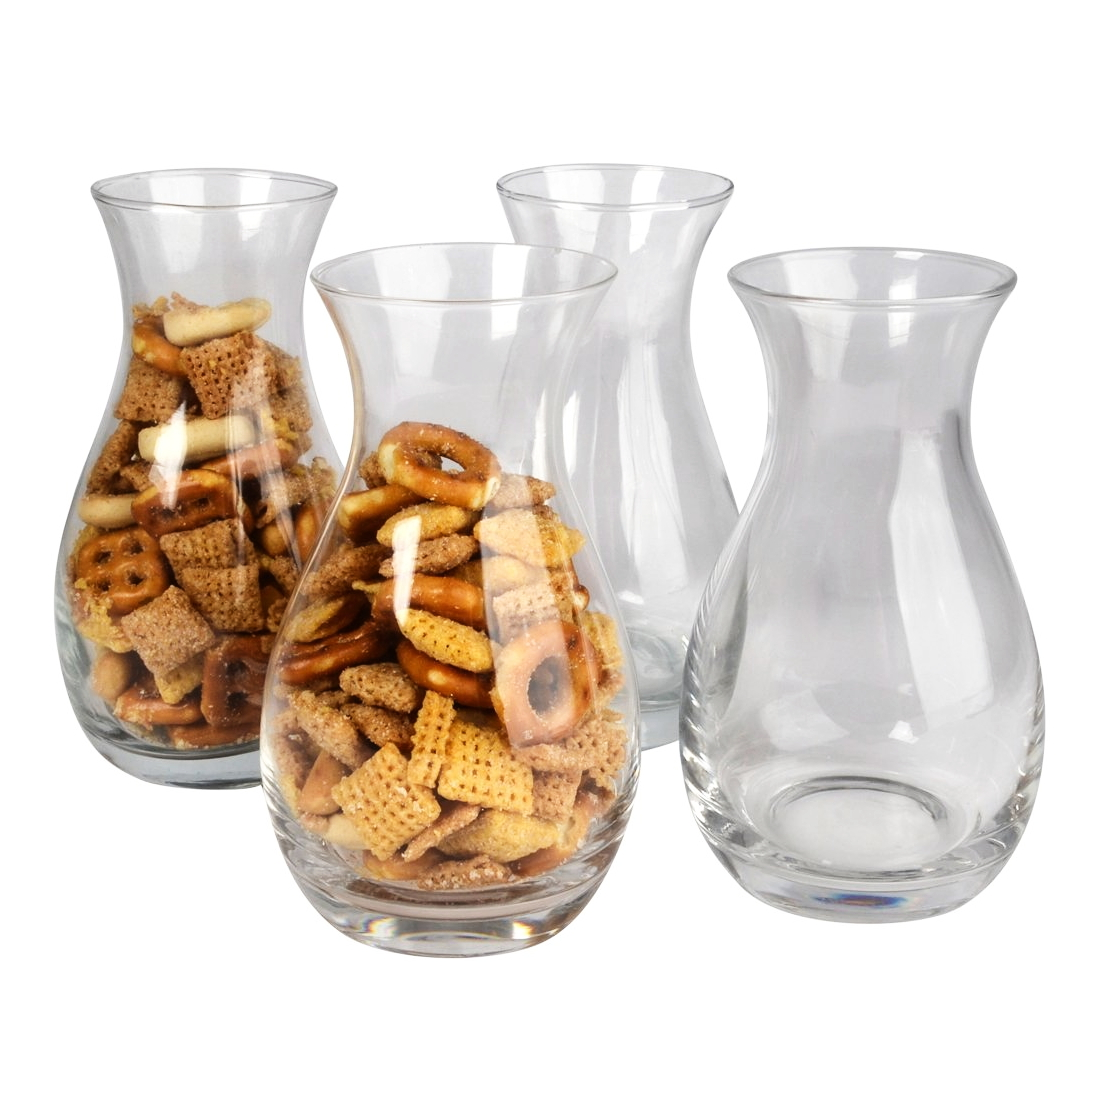 Artland Barkeep 8 Ounce Bar Snacker Jar, Set of 4